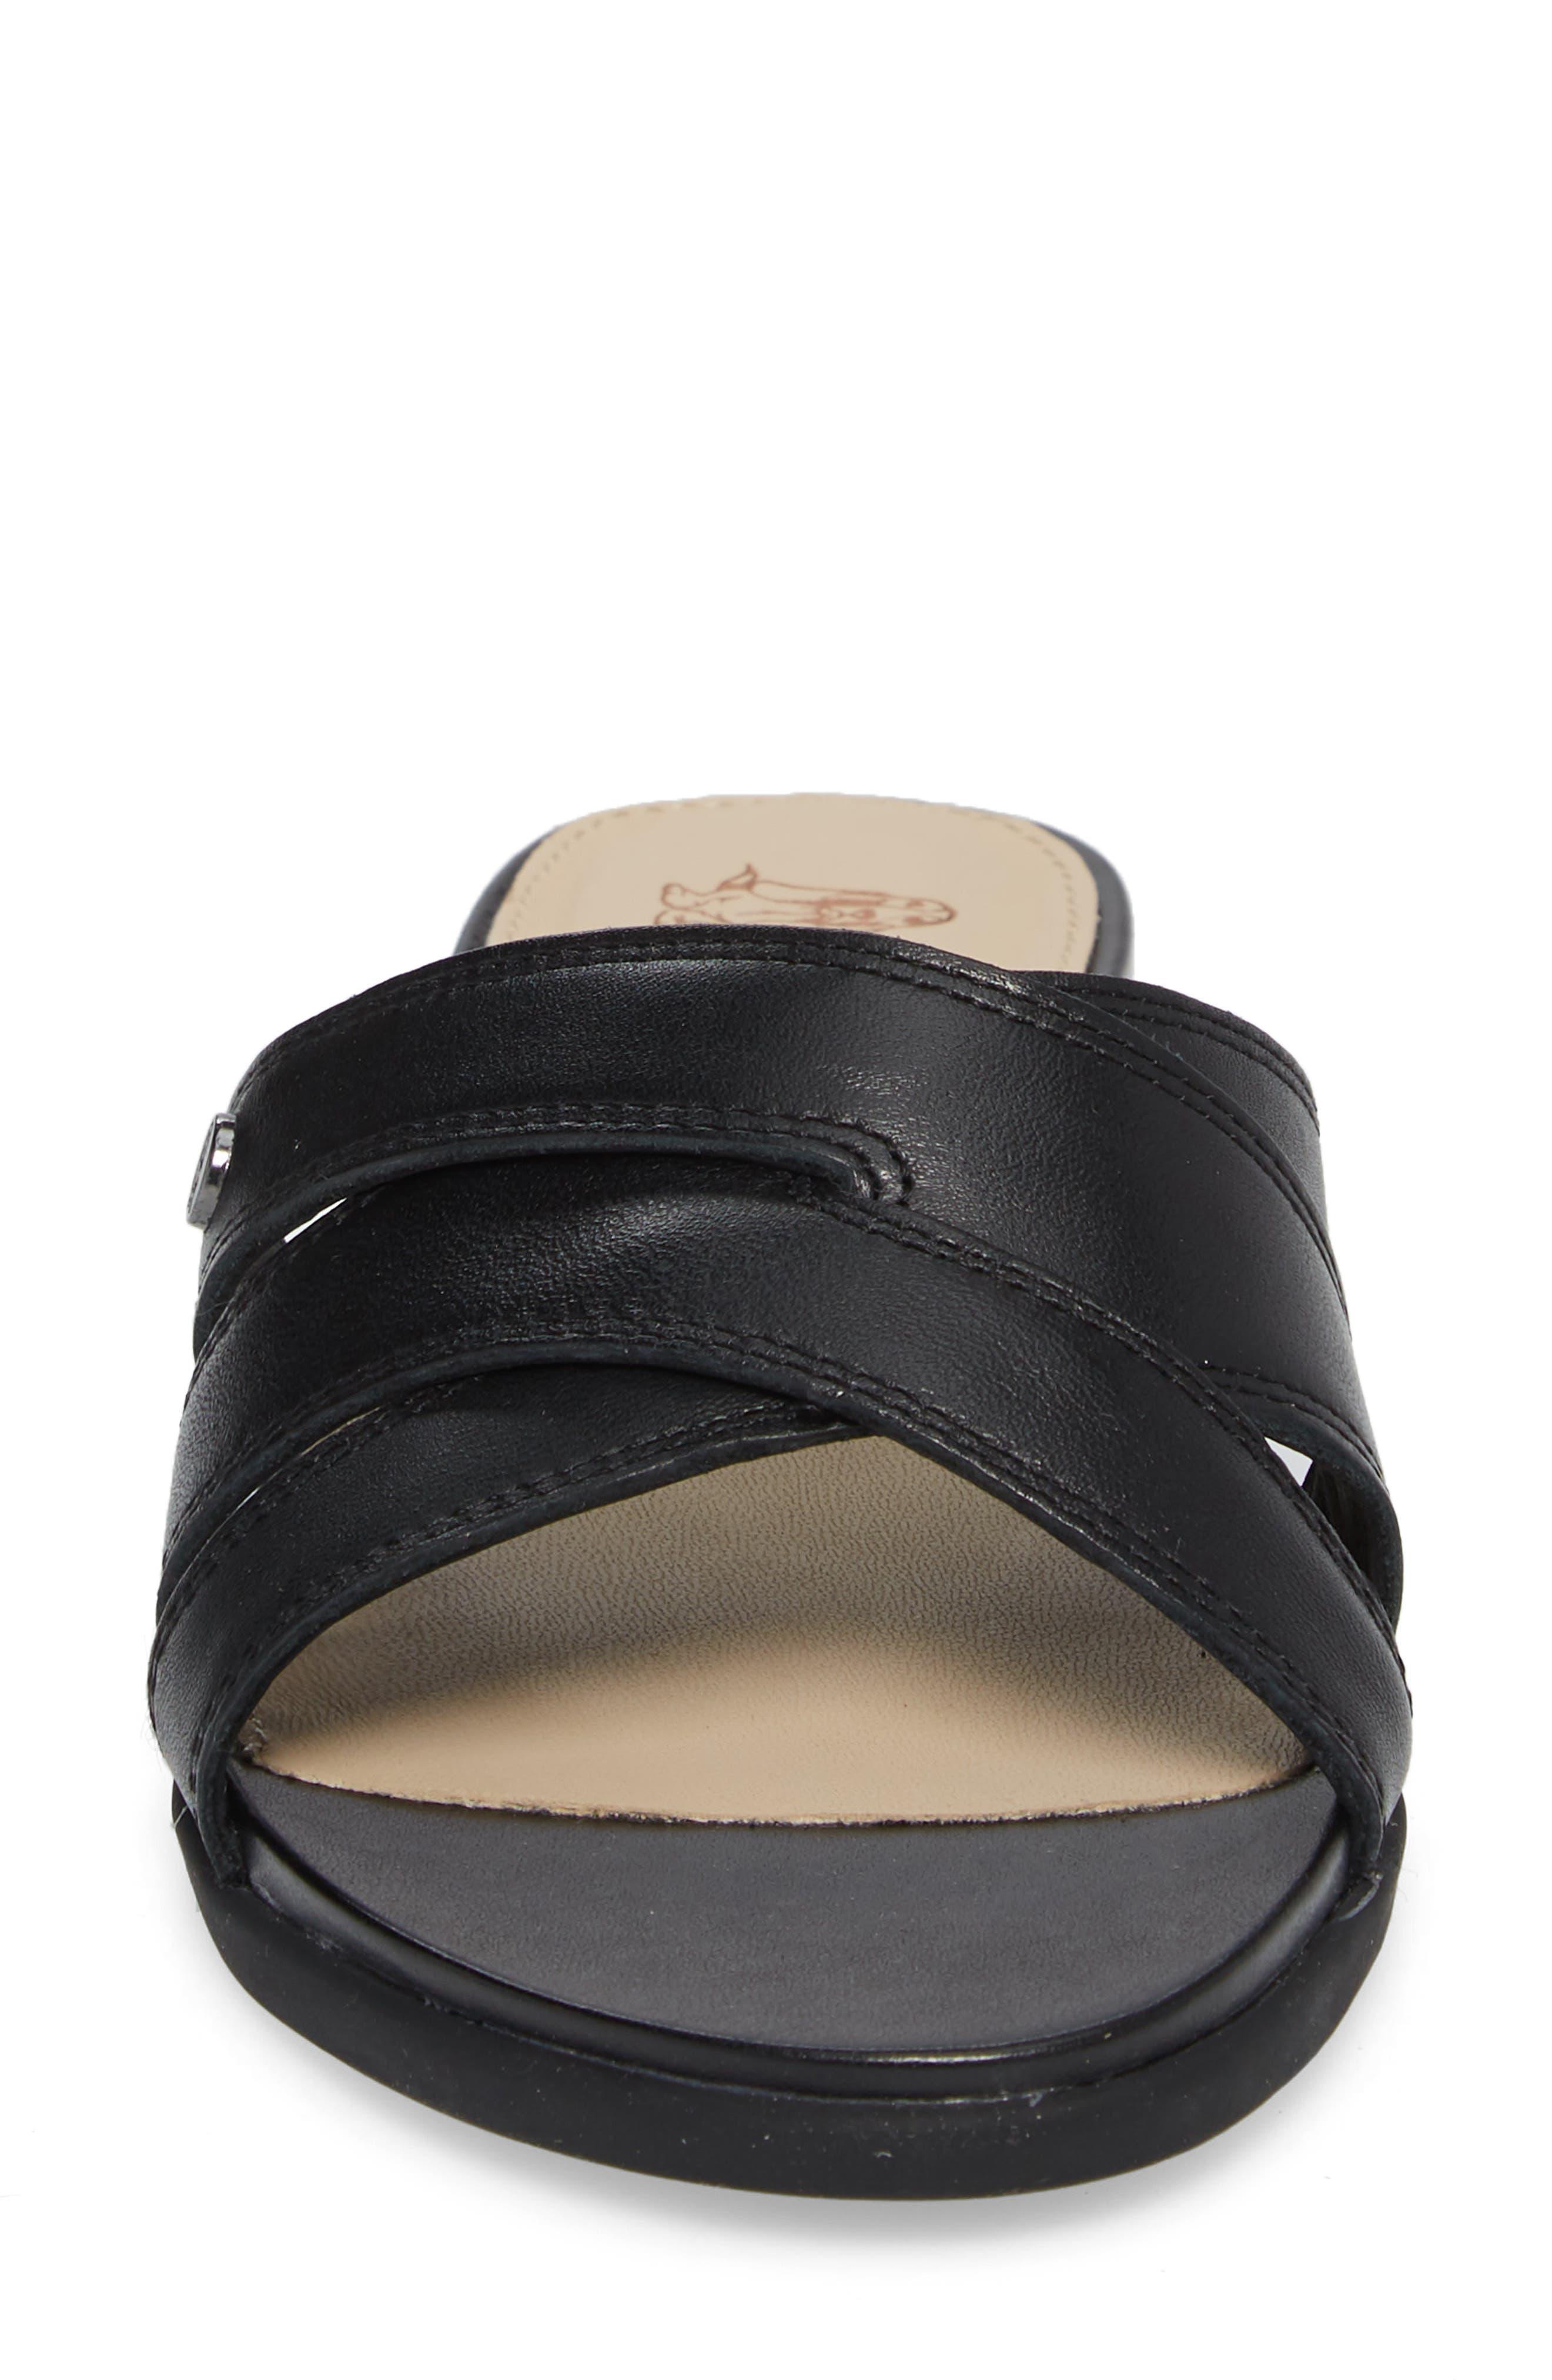 Dalmatian Slide Sandal,                             Alternate thumbnail 4, color,                             007